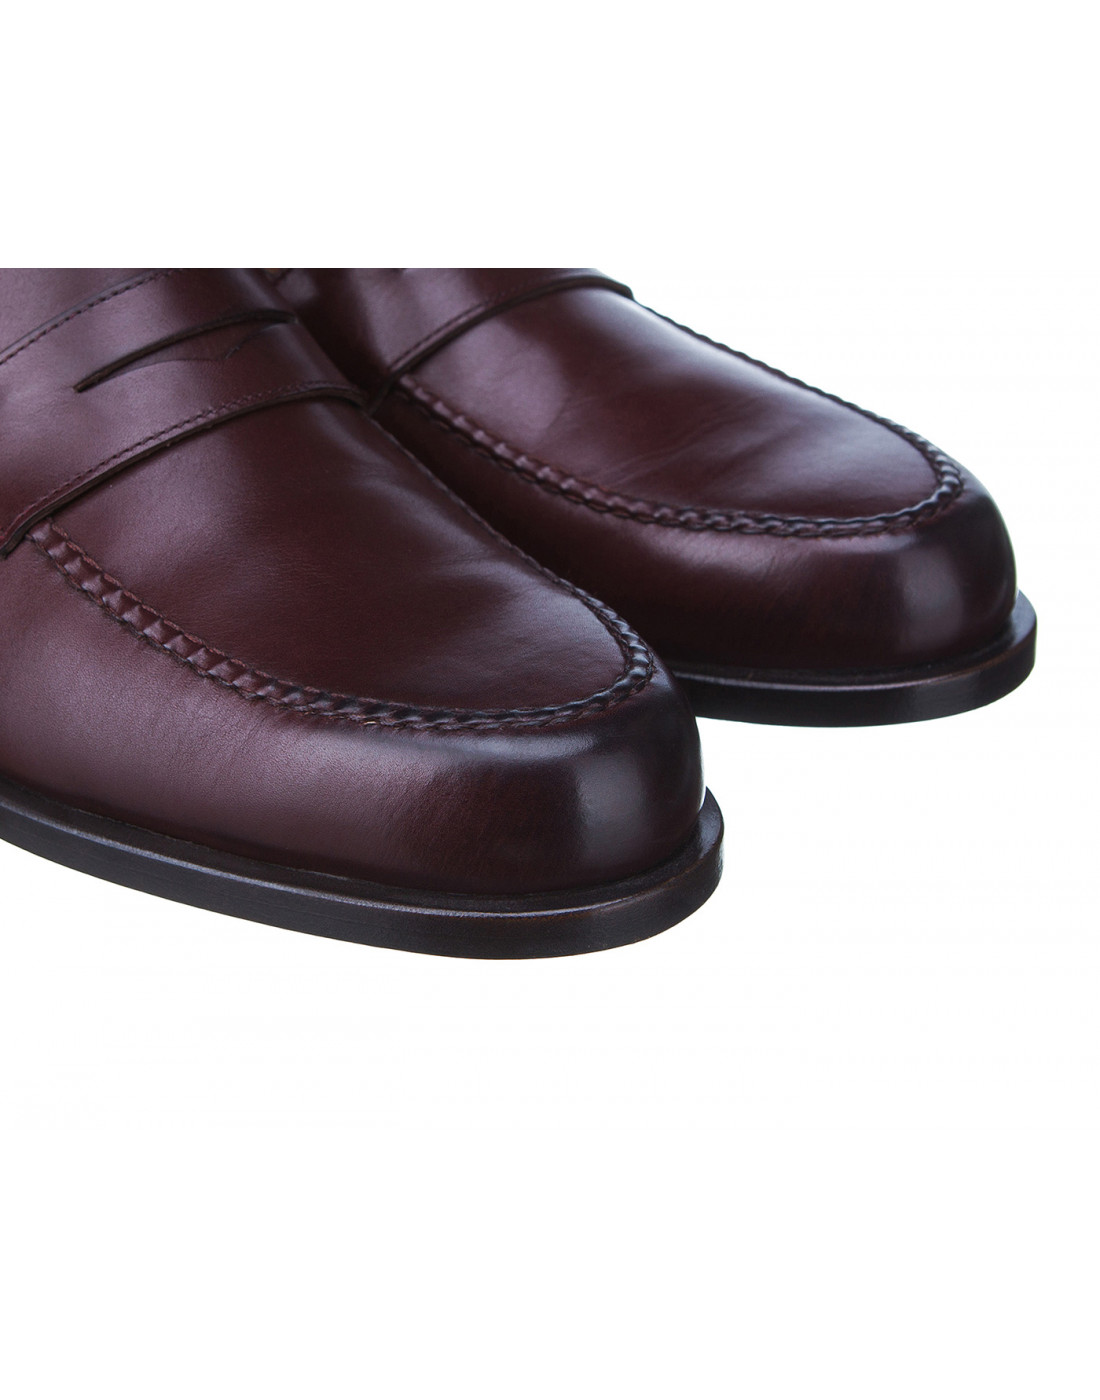 Туфли коричневые мужские Fratelli Rossetti S12597-4